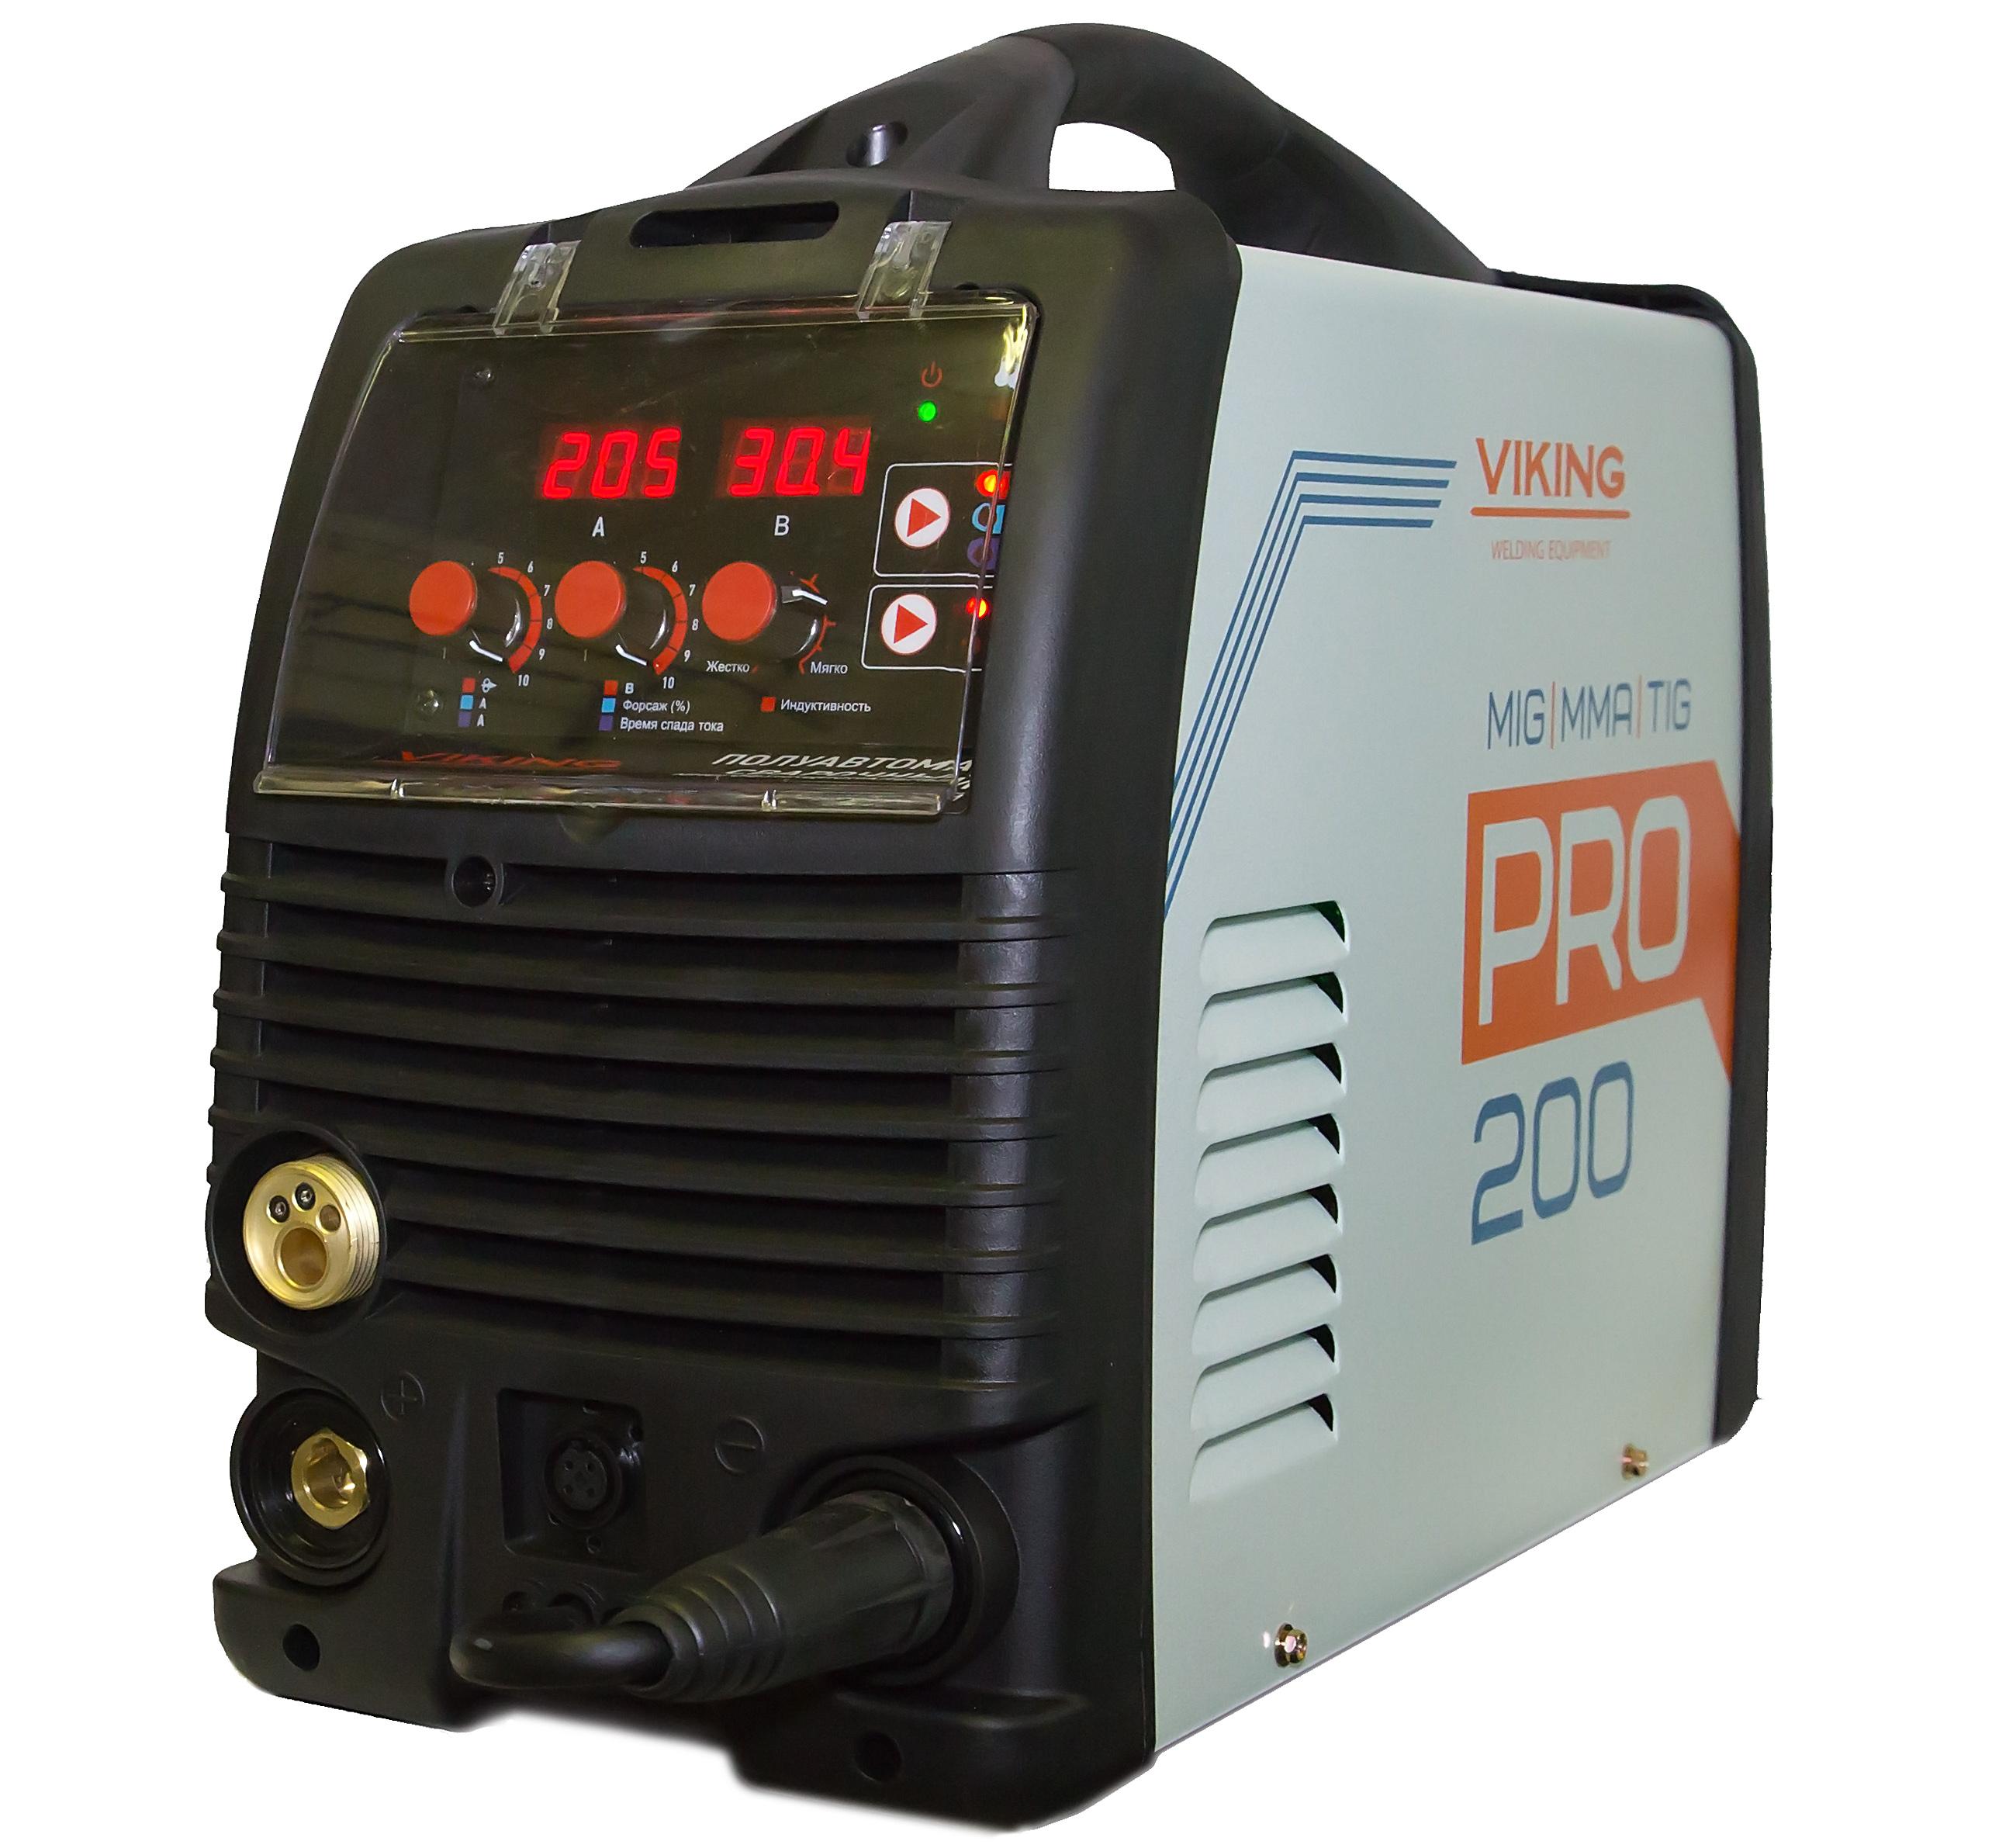 Сварочный аппарат Viking 200 pro сварочный аппарат сварог pro tig 200 p dsp w212